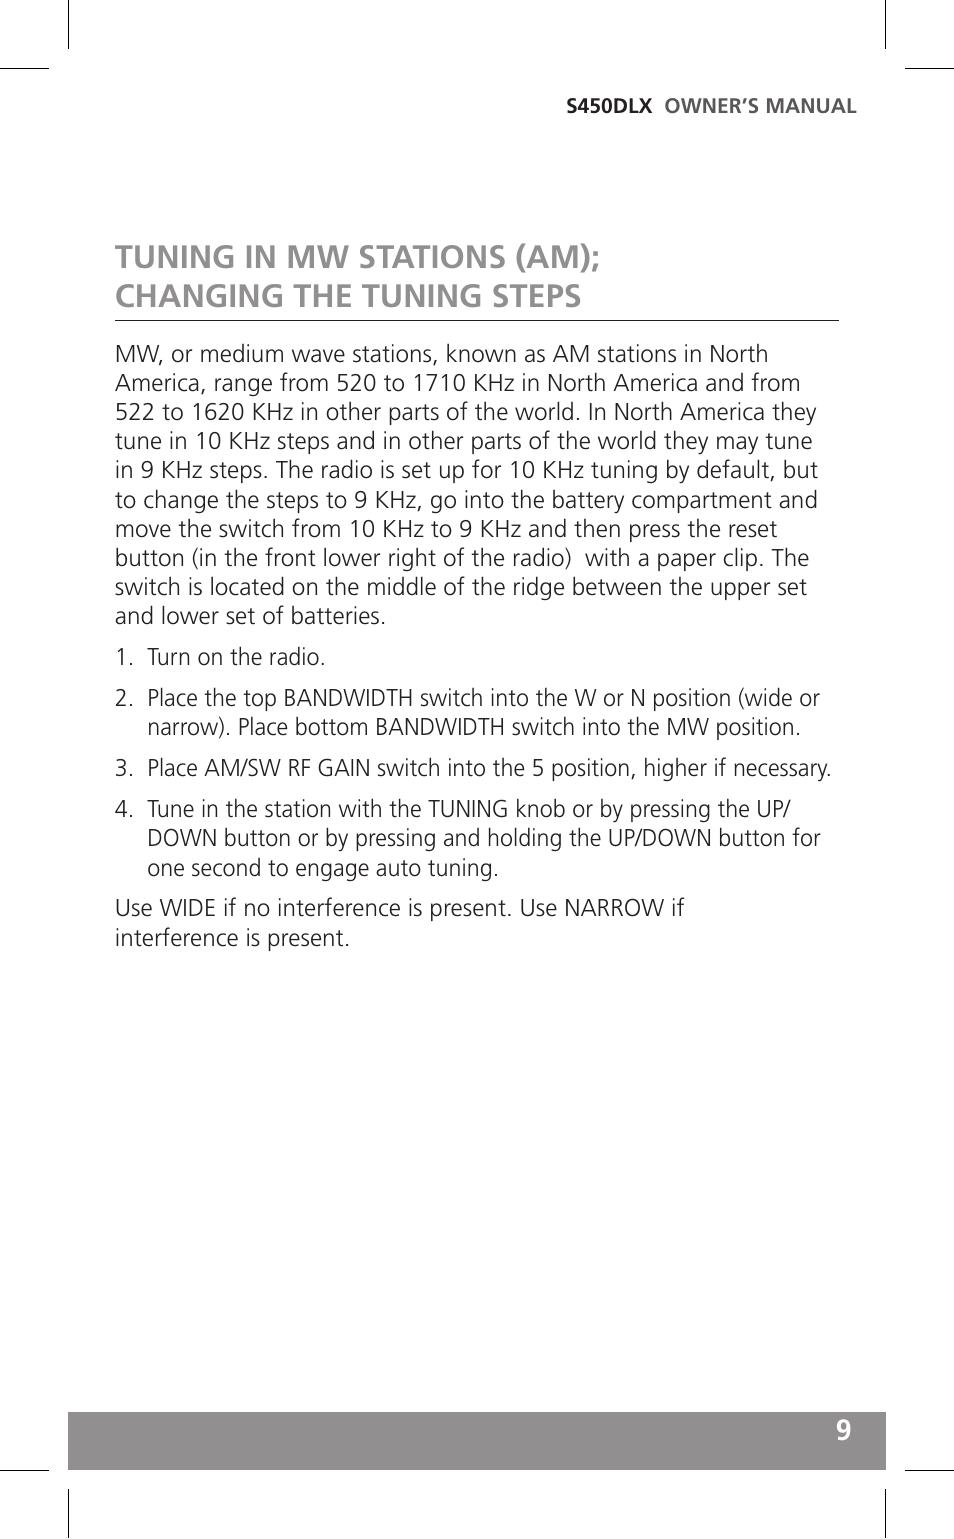 Grundig Field Radio S450dlx User Manual Manual Guide